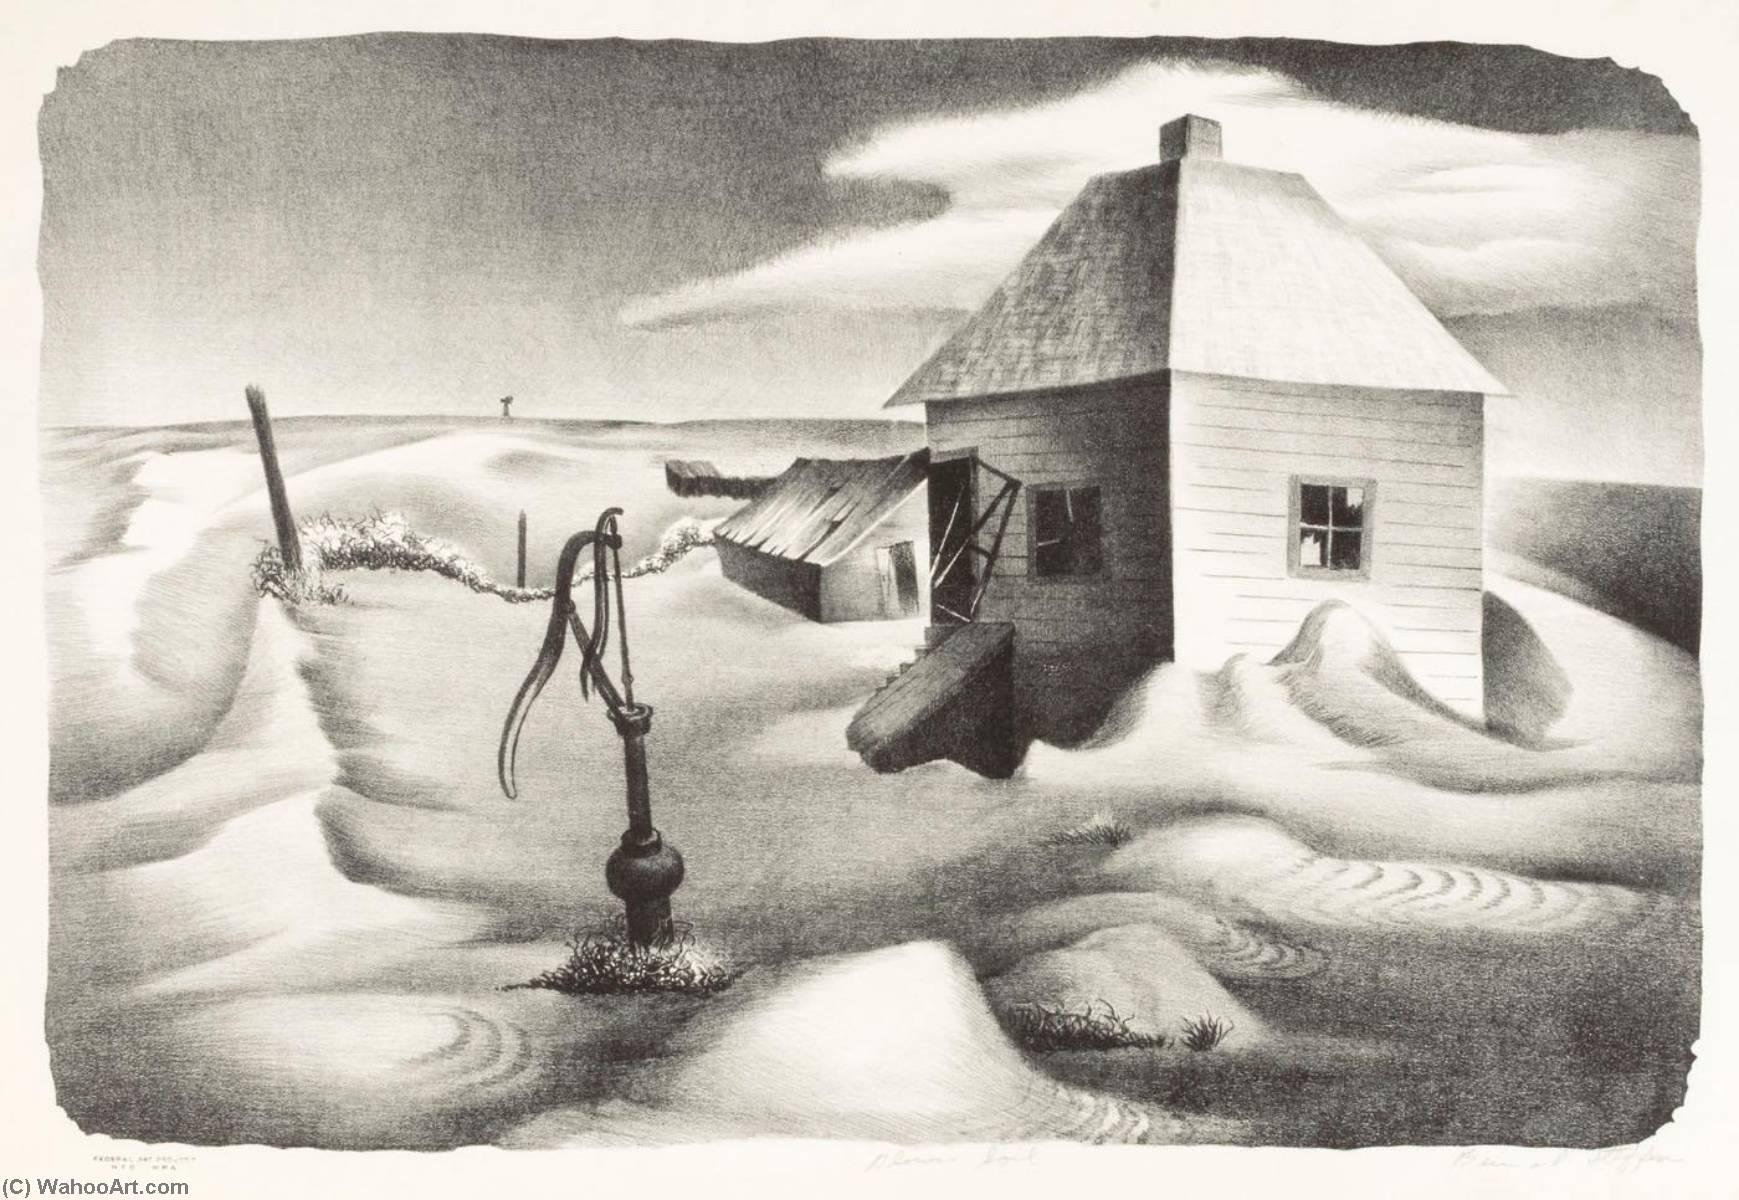 Wikioo.org - The Encyclopedia of Fine Arts - Painting, Artwork by Bernard Steffen - Blown Soil